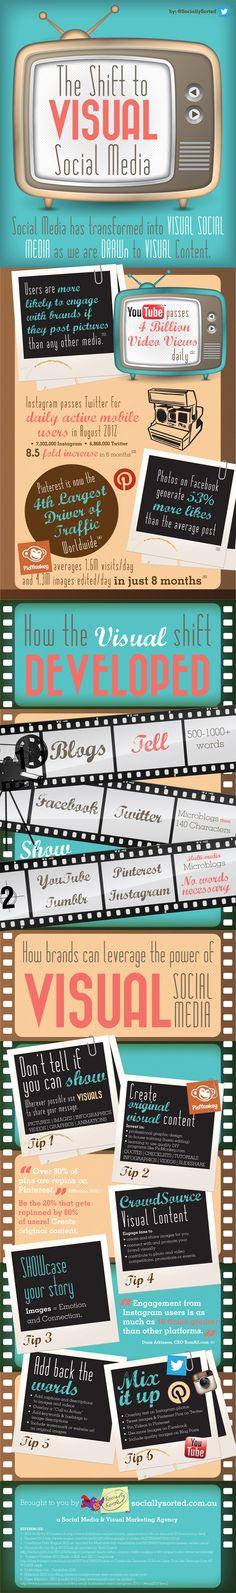 Social Media gets VISUAL - #visualcontent #socialmedia